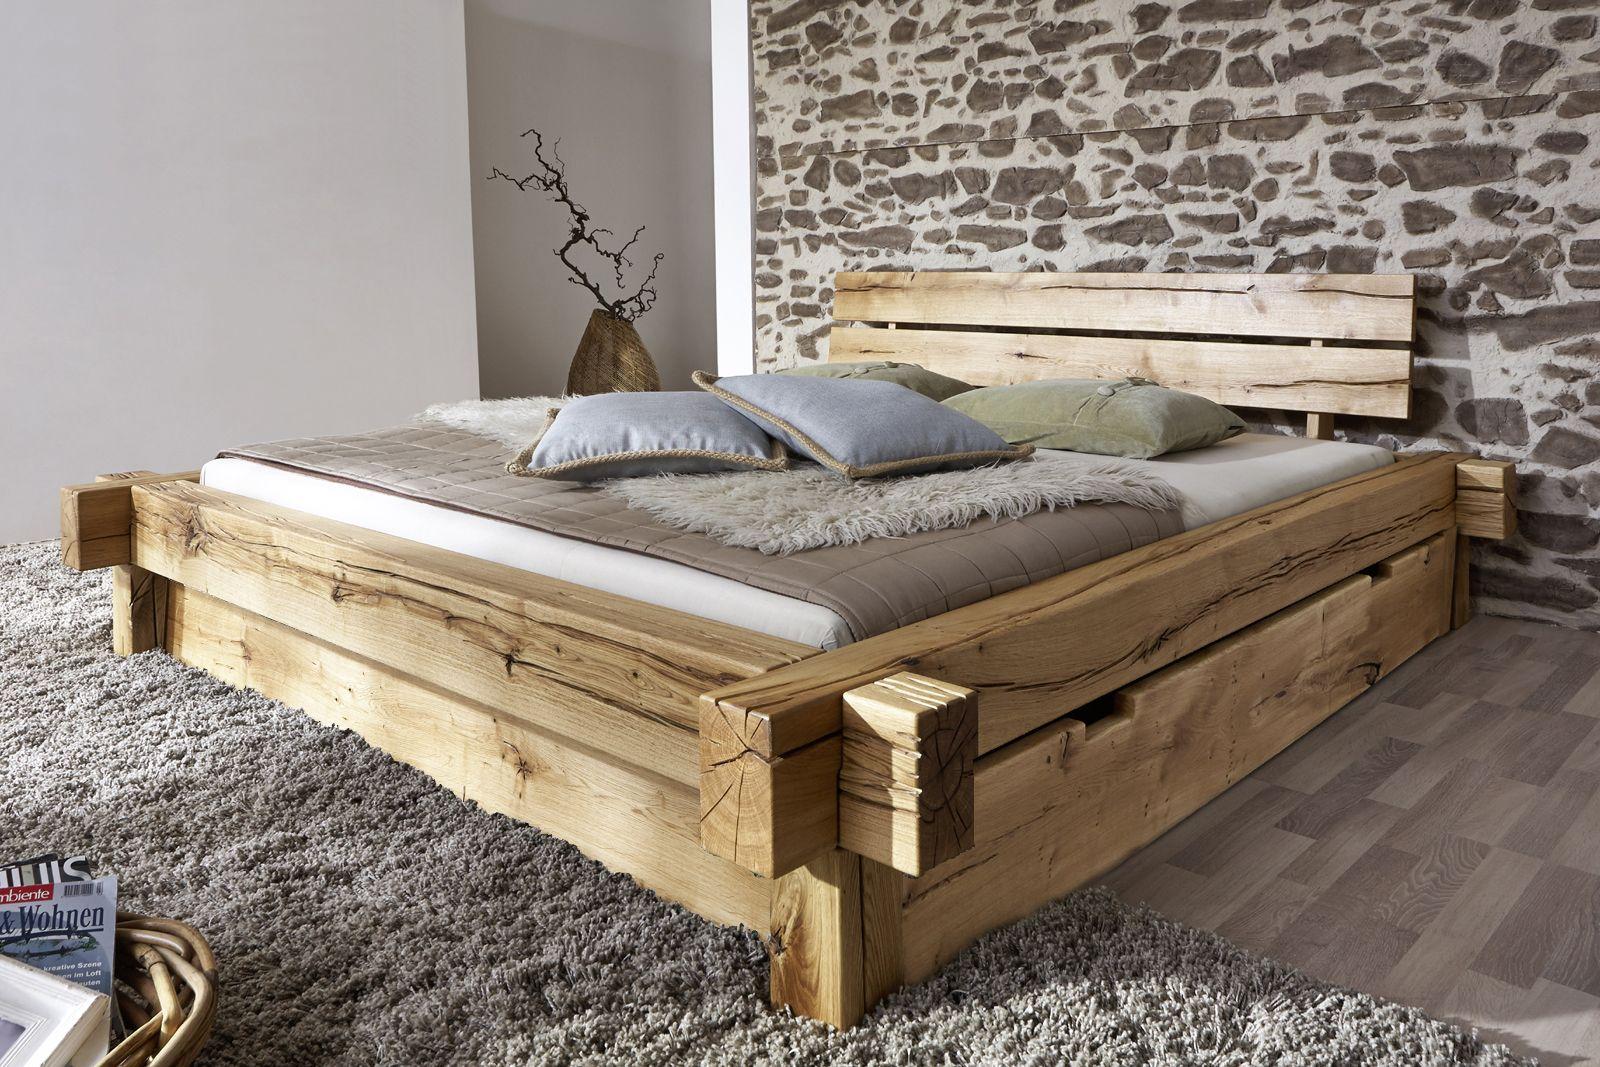 SAM® Balkenbett Jonas Holzbett mit Schubkästen 180x200 cm Auf Lager! #rusticbedroomfurniture